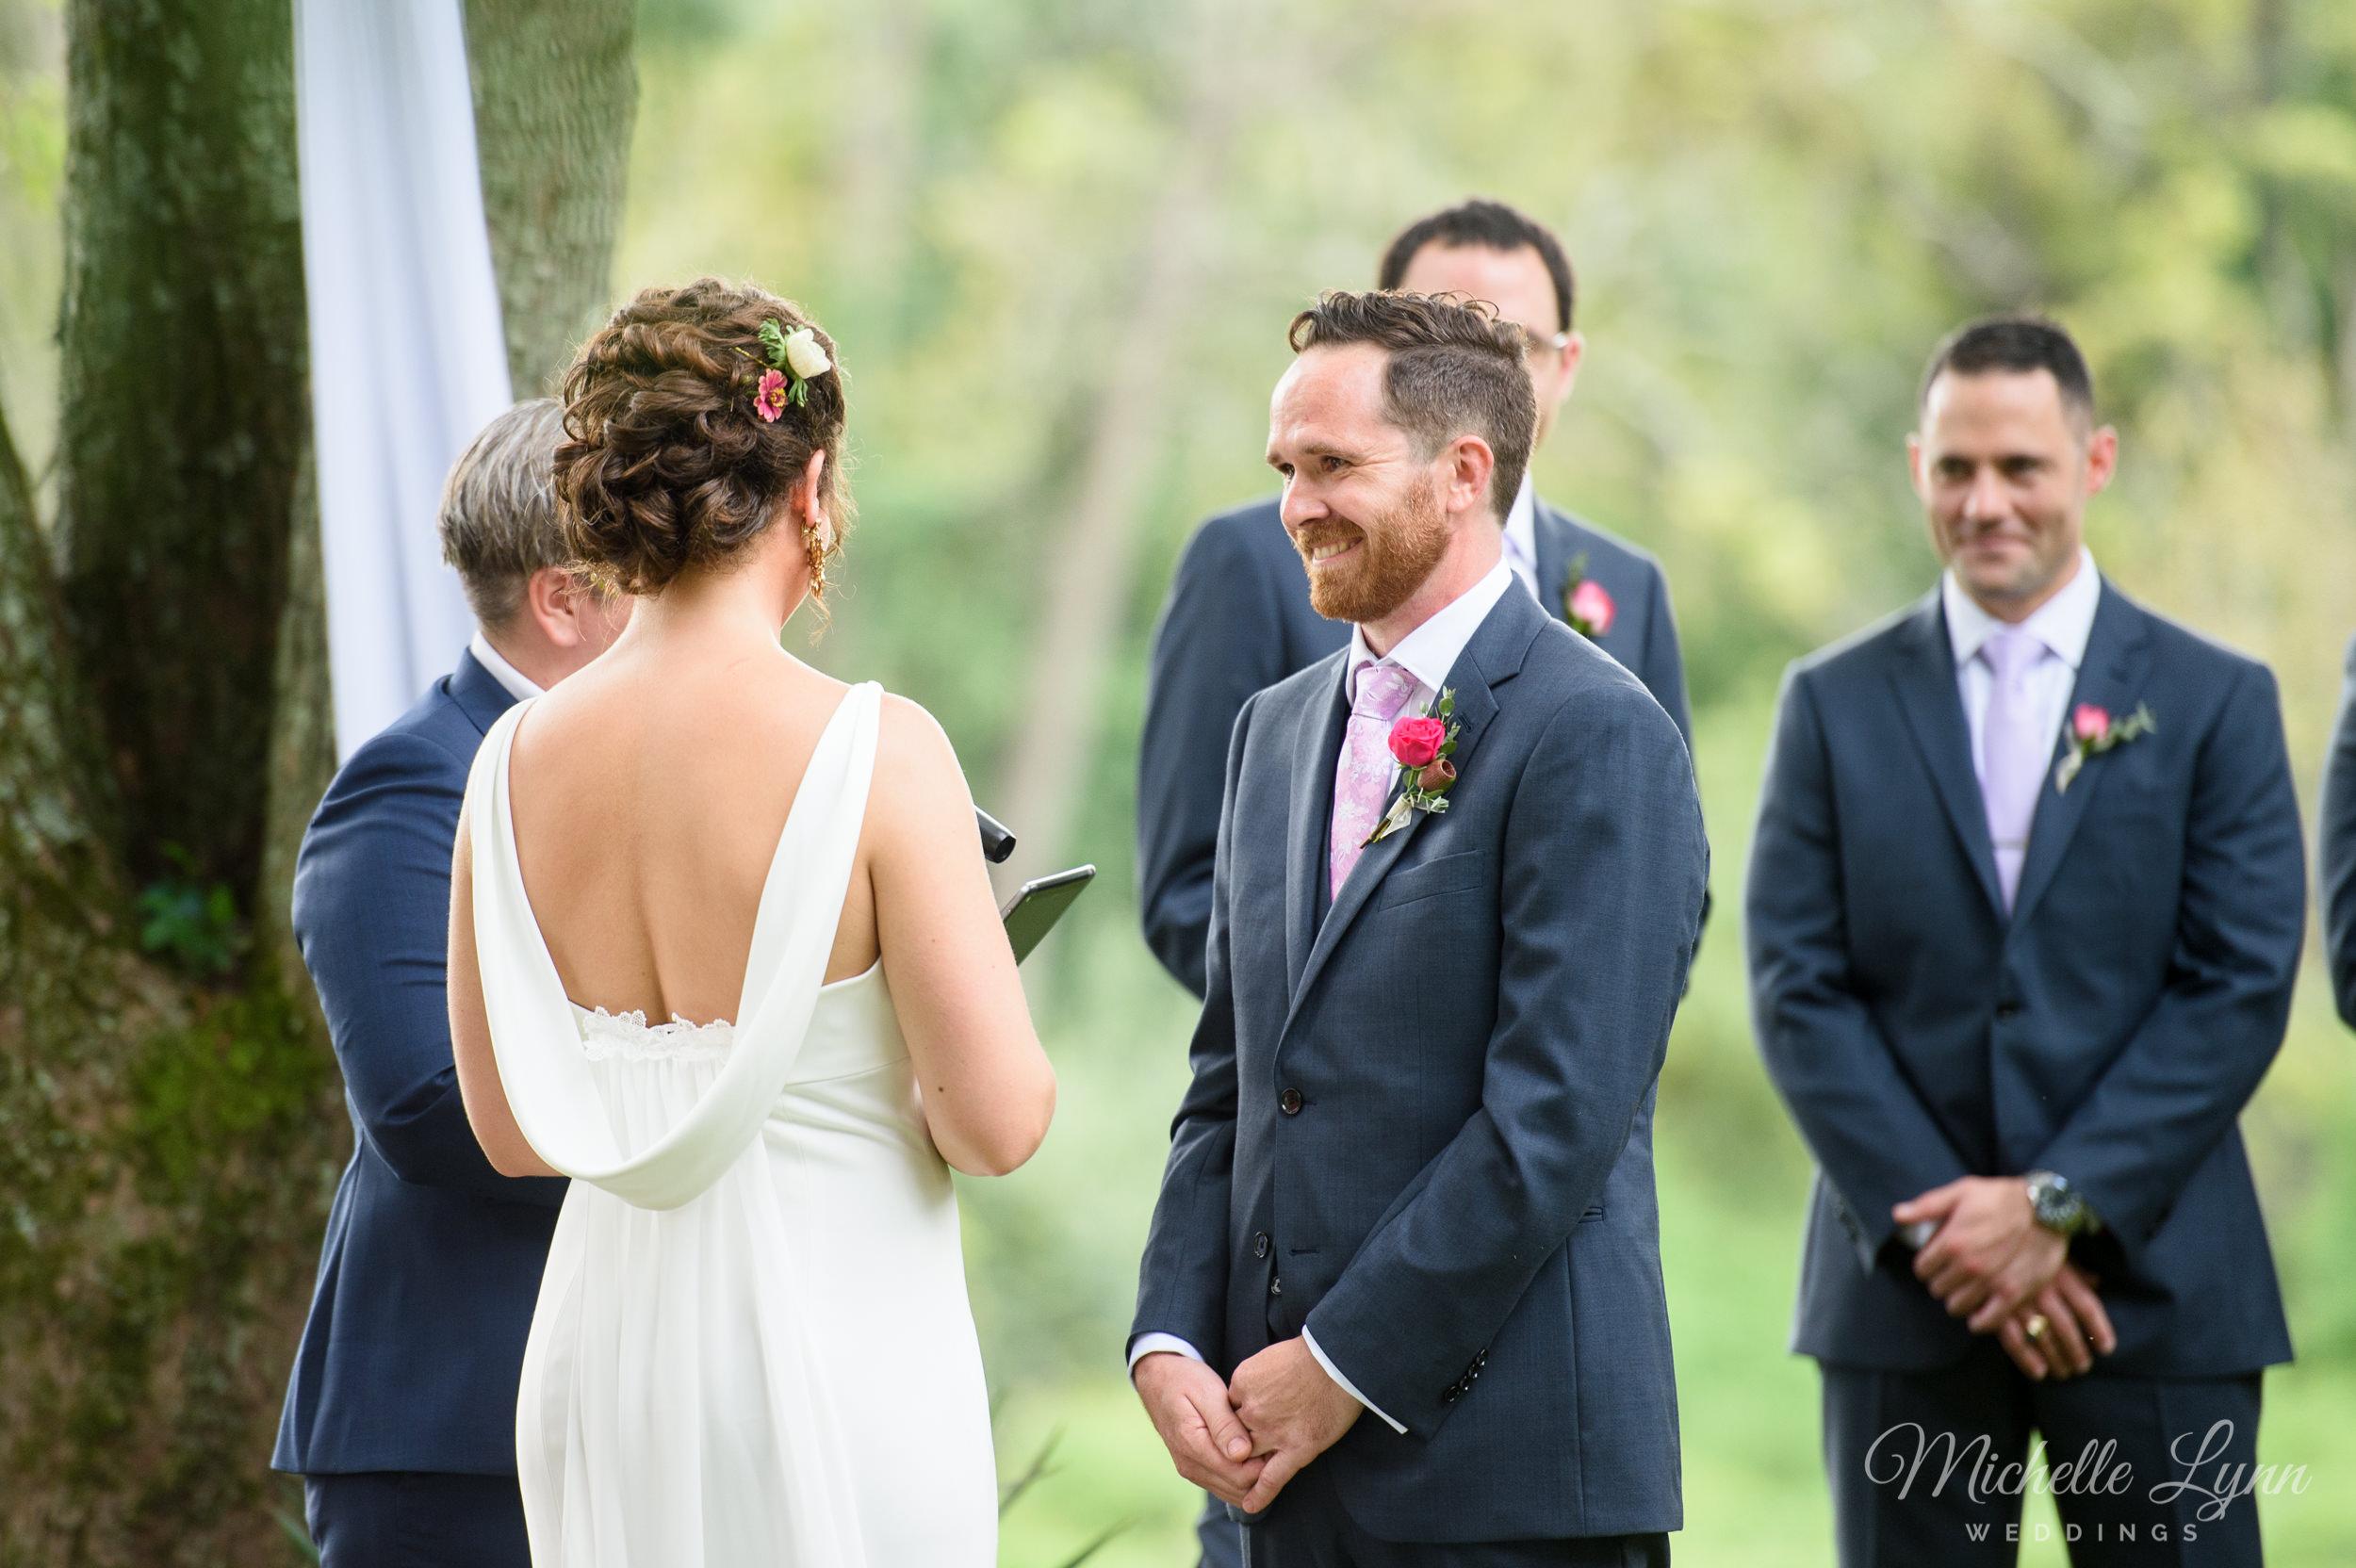 mlw-unionville-vineyards-nj-wedding-photography-42.jpg